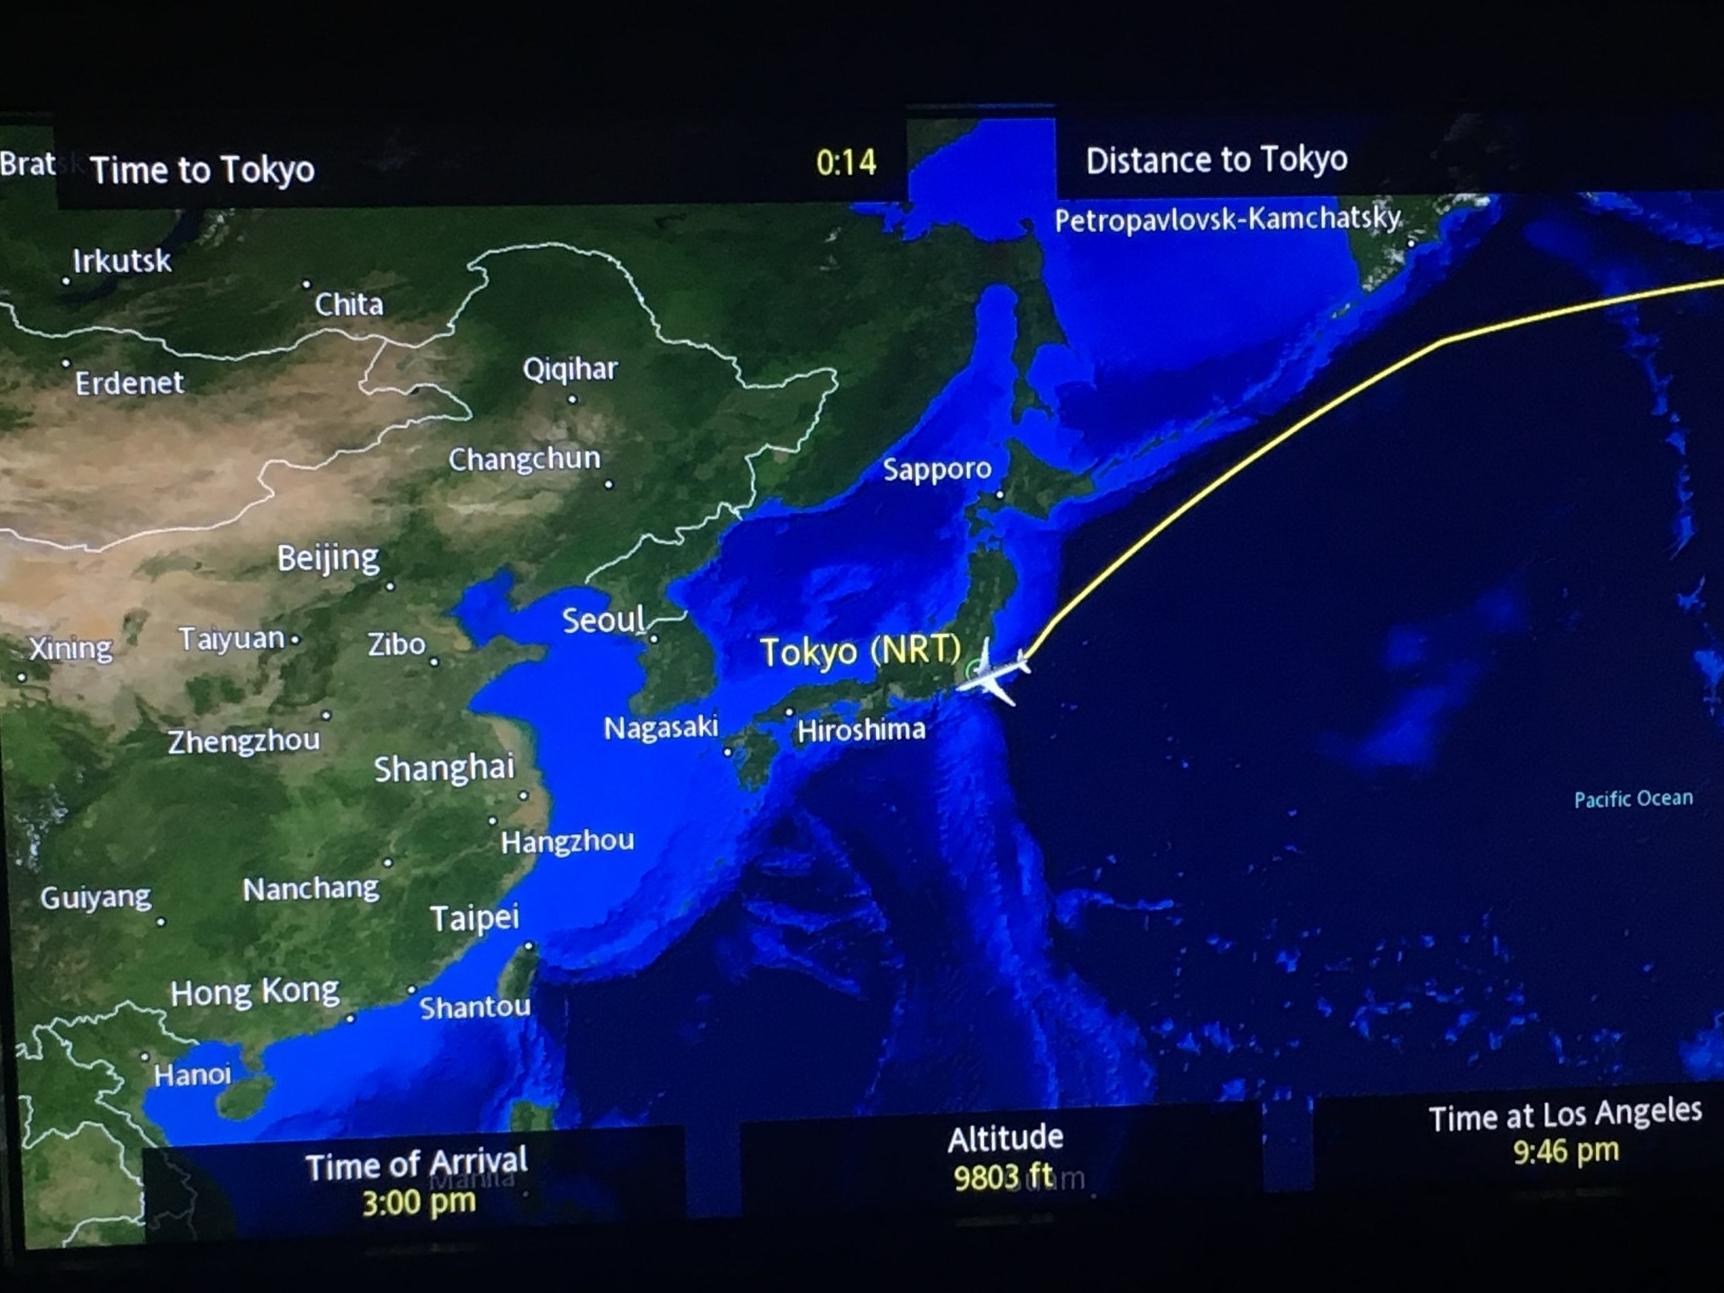 Flight map showing Hiroshima.JPG